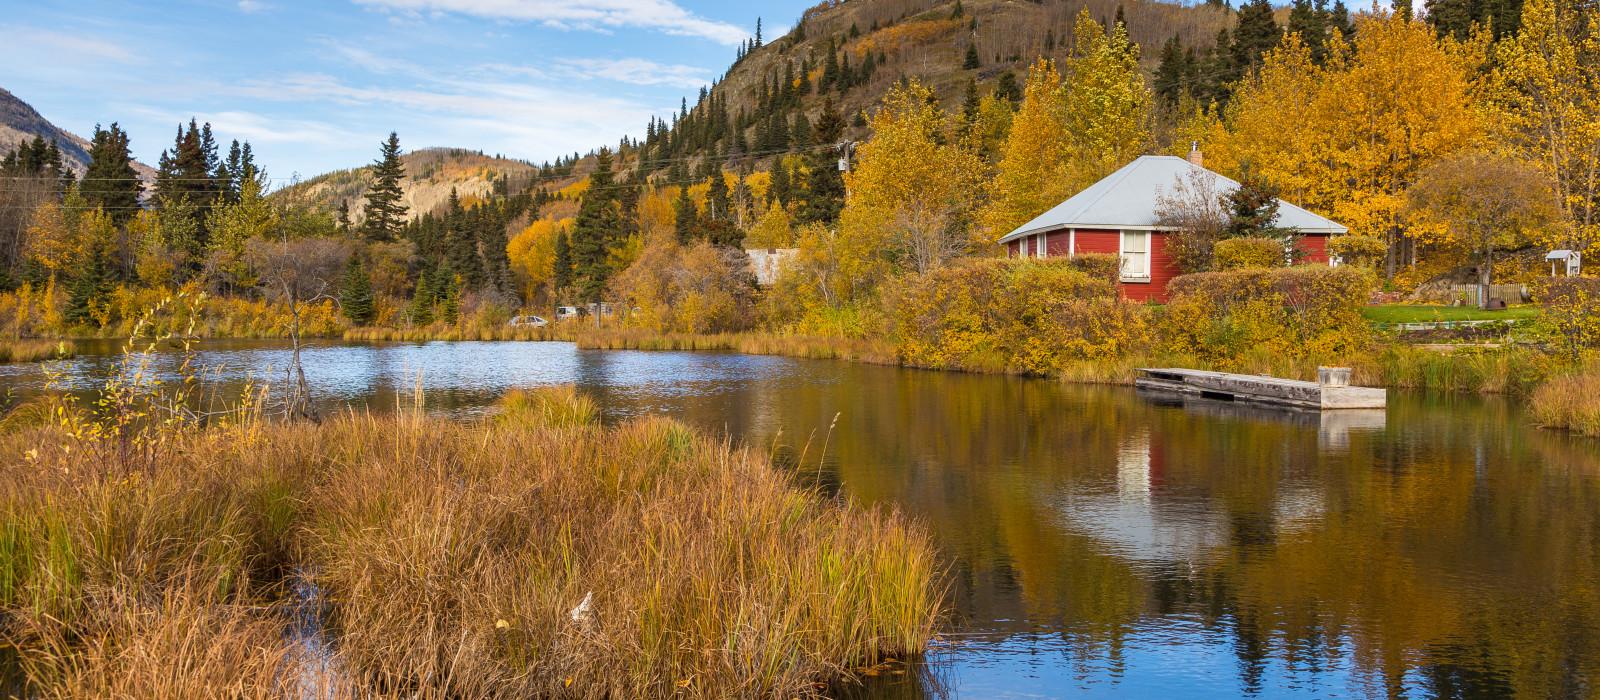 Reiseziel Chitina Alaska